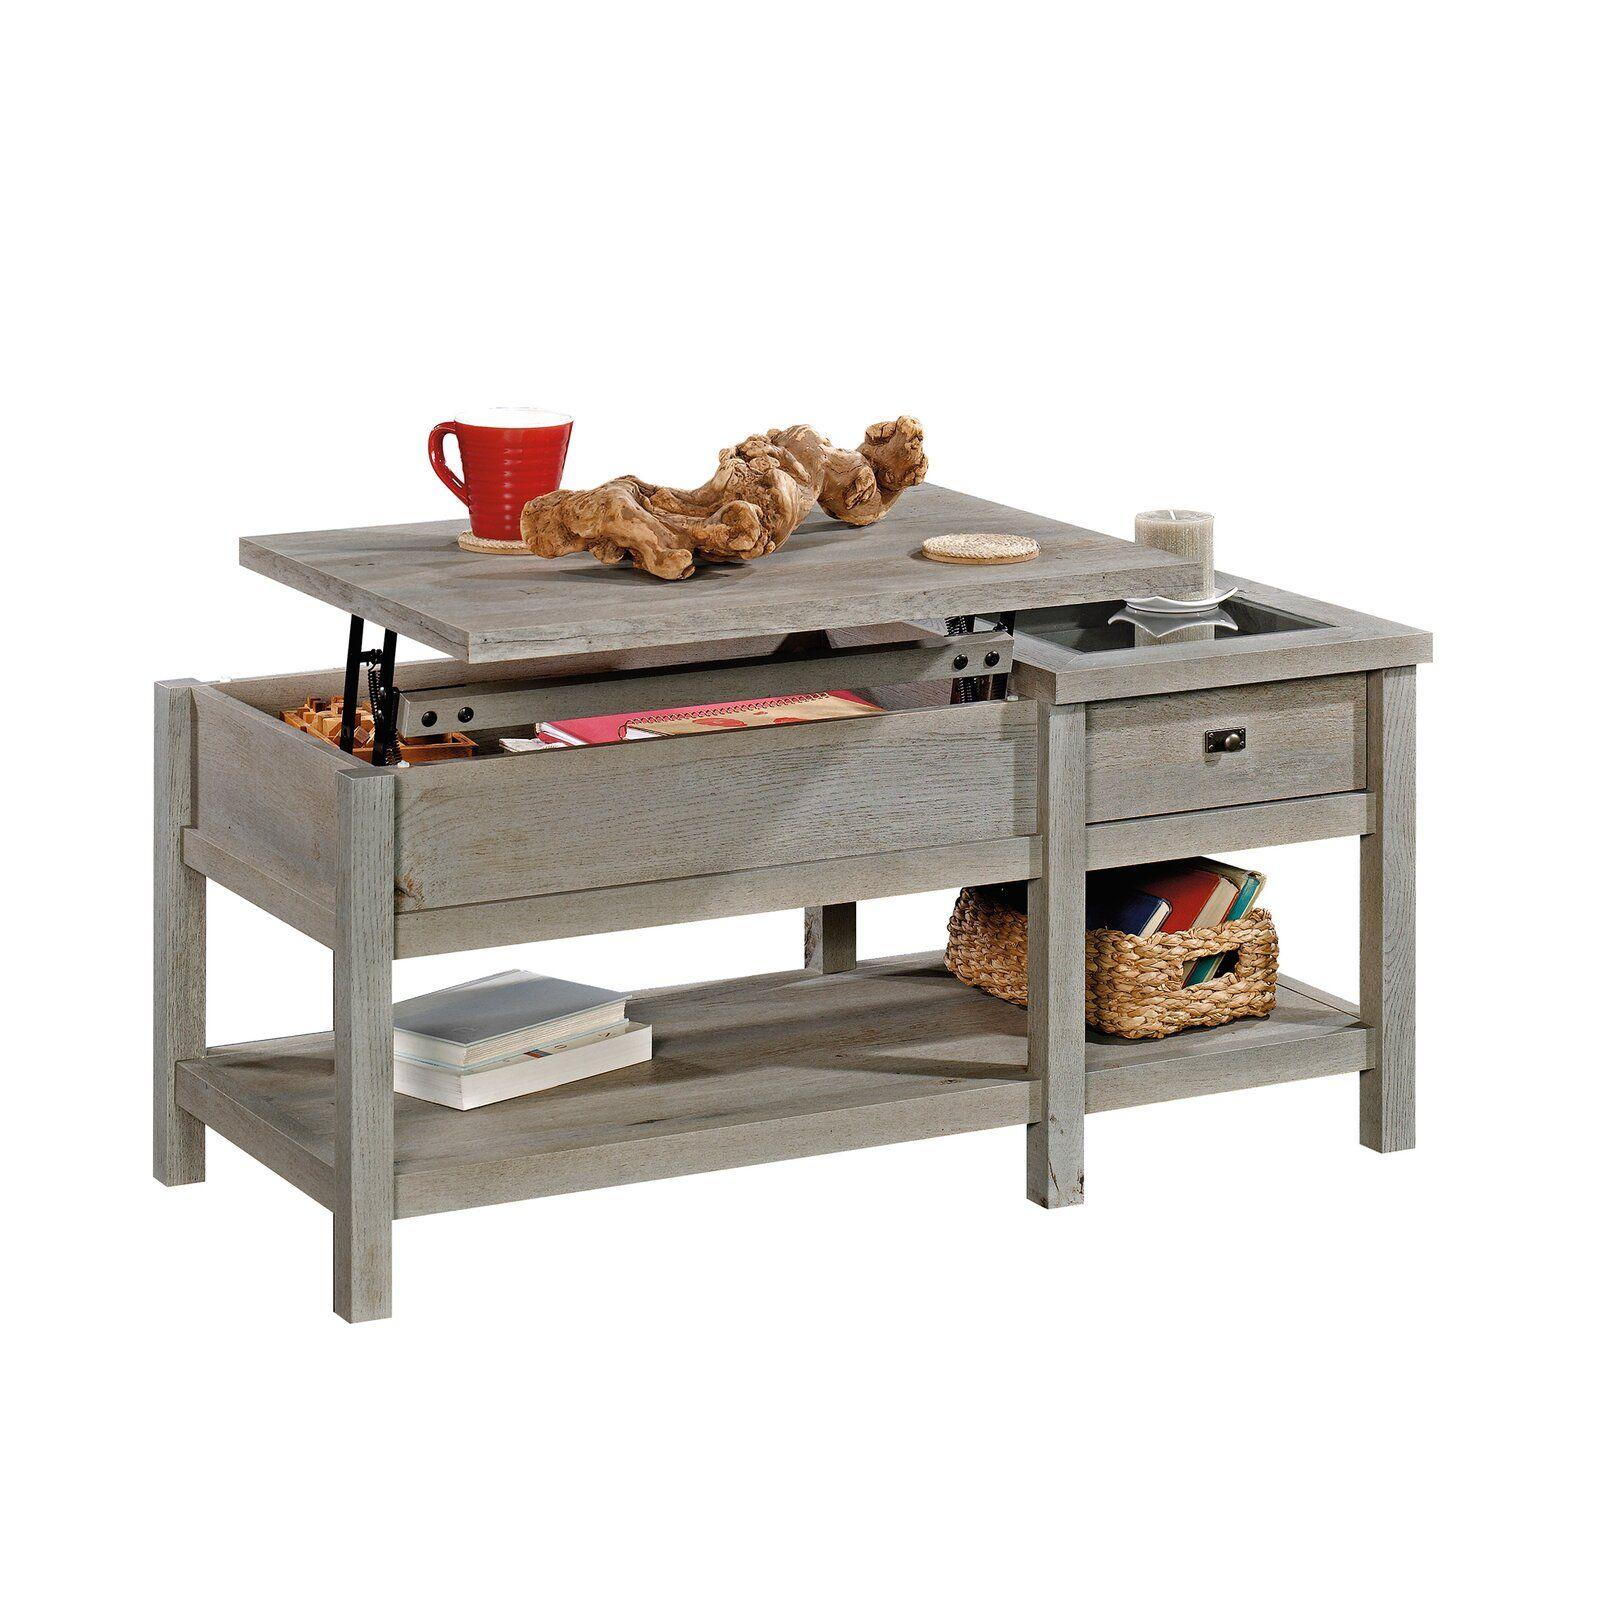 Highland Dunes Myrasol Coffee Table Wayfair Coffee Table Wayfair Coffee Table Cool Coffee Tables [ 1600 x 1600 Pixel ]